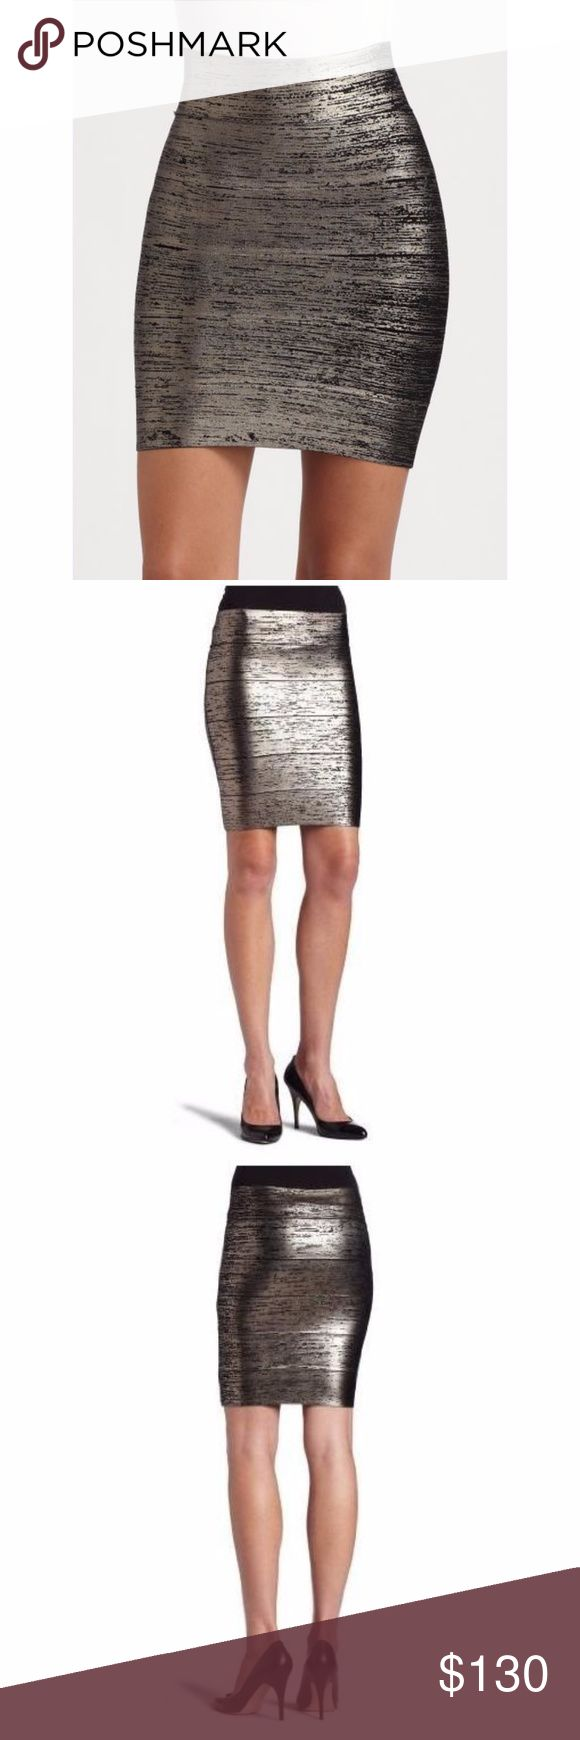 BCBG Foil Metallic Mini Skirt Worn twice - very cute and sexy -  ****price lowered to match market rate**** BCBGMaxAzria Skirts Mini